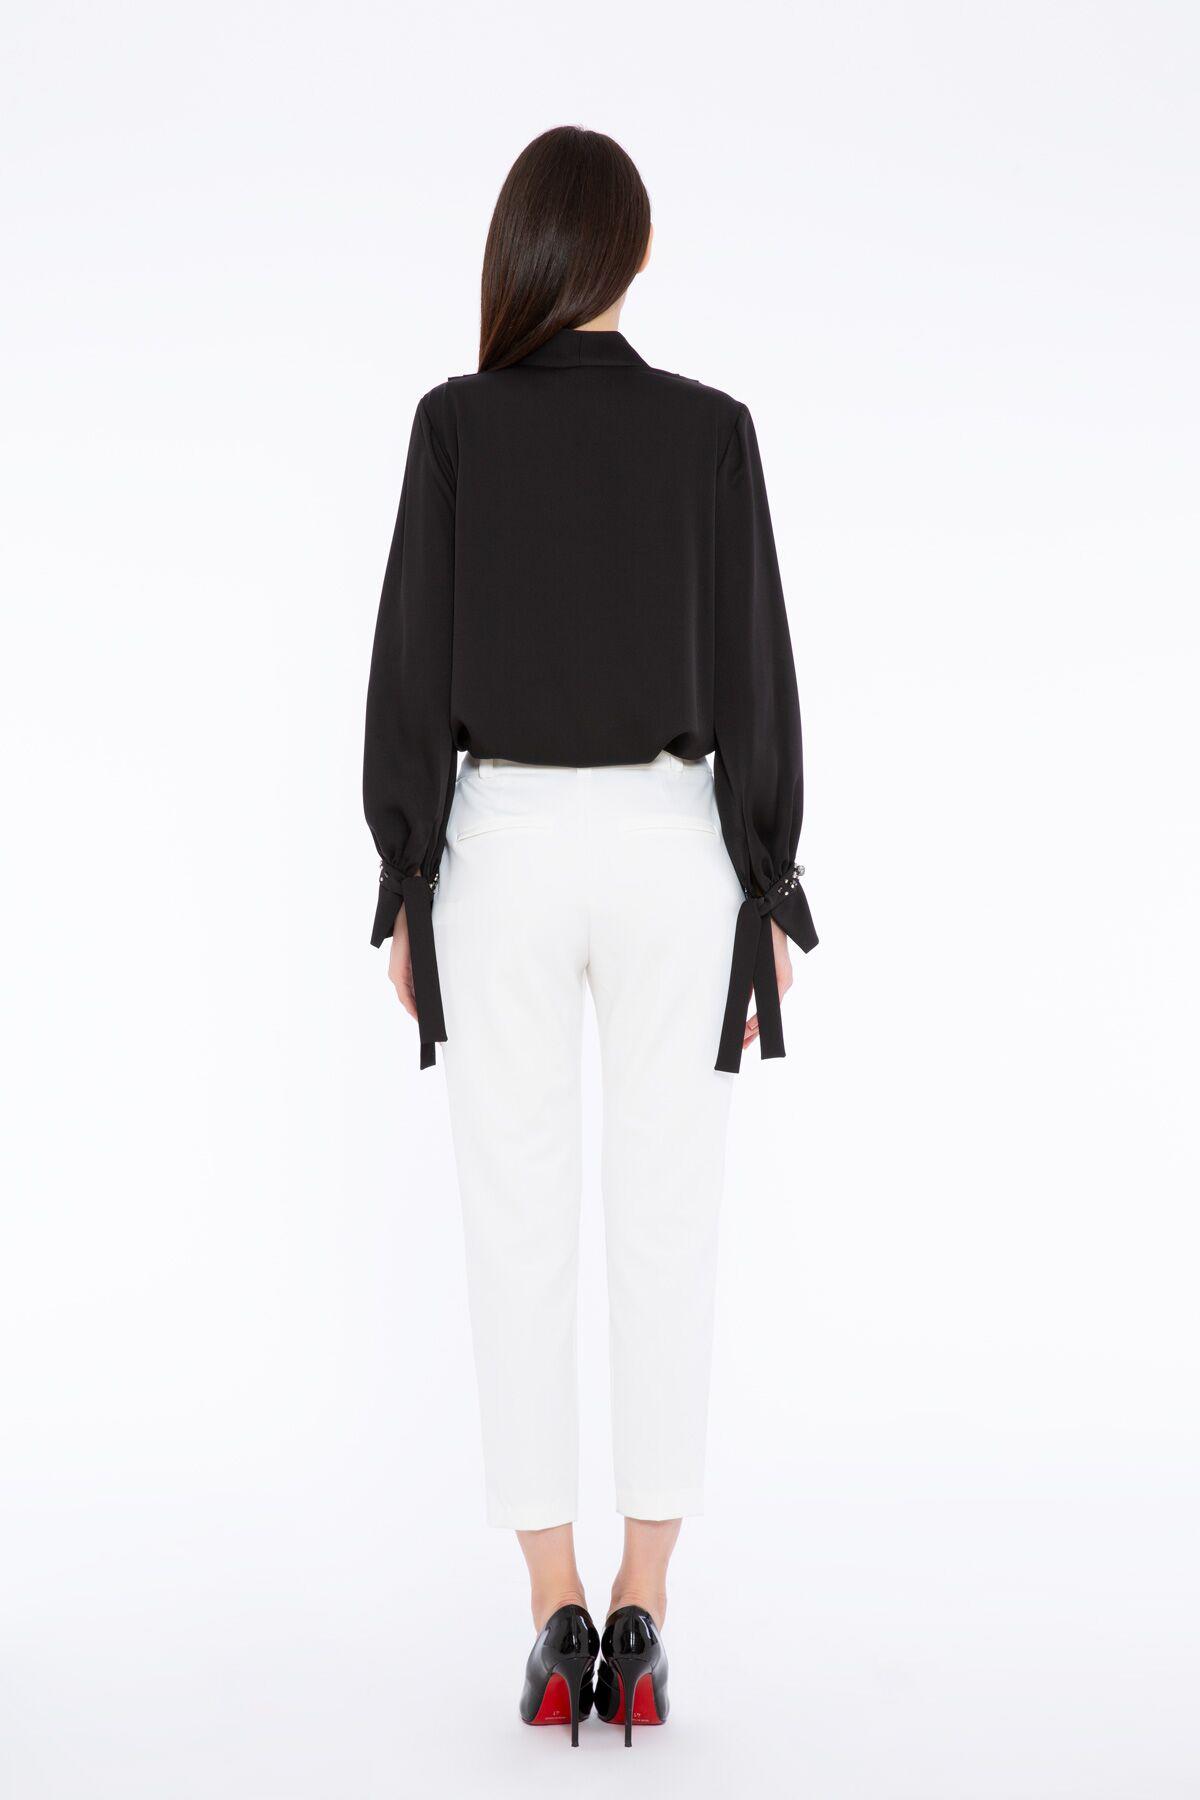 İşleme/Manşet Detaylı V Yaka Anvelop Bluz